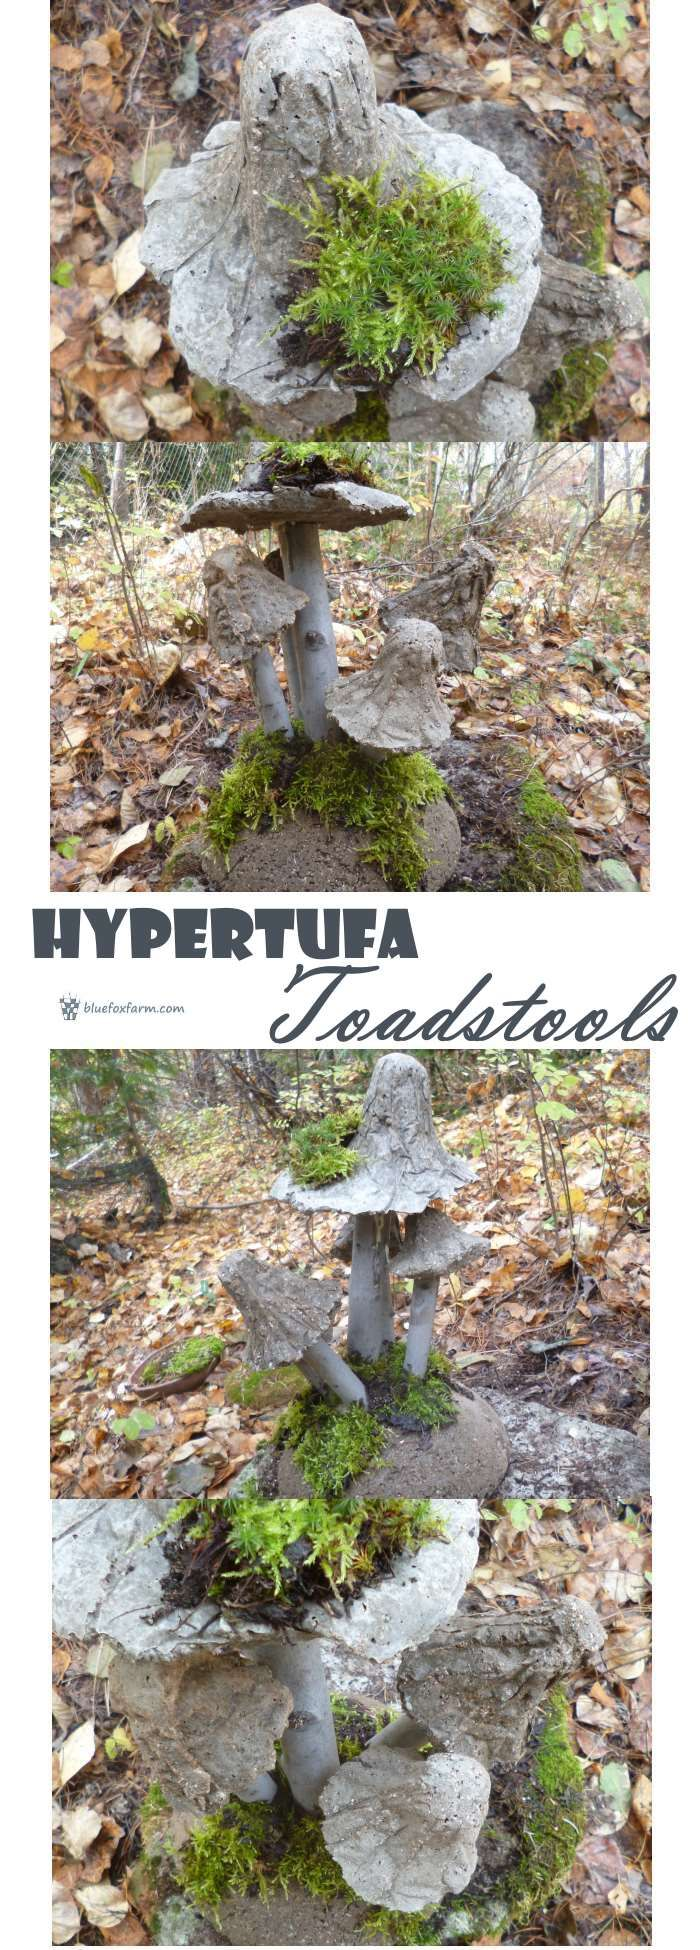 Hypertufa Toadstools - not just your ordinary mushrooms... Rustic Garden Art   Hypertufa Projects